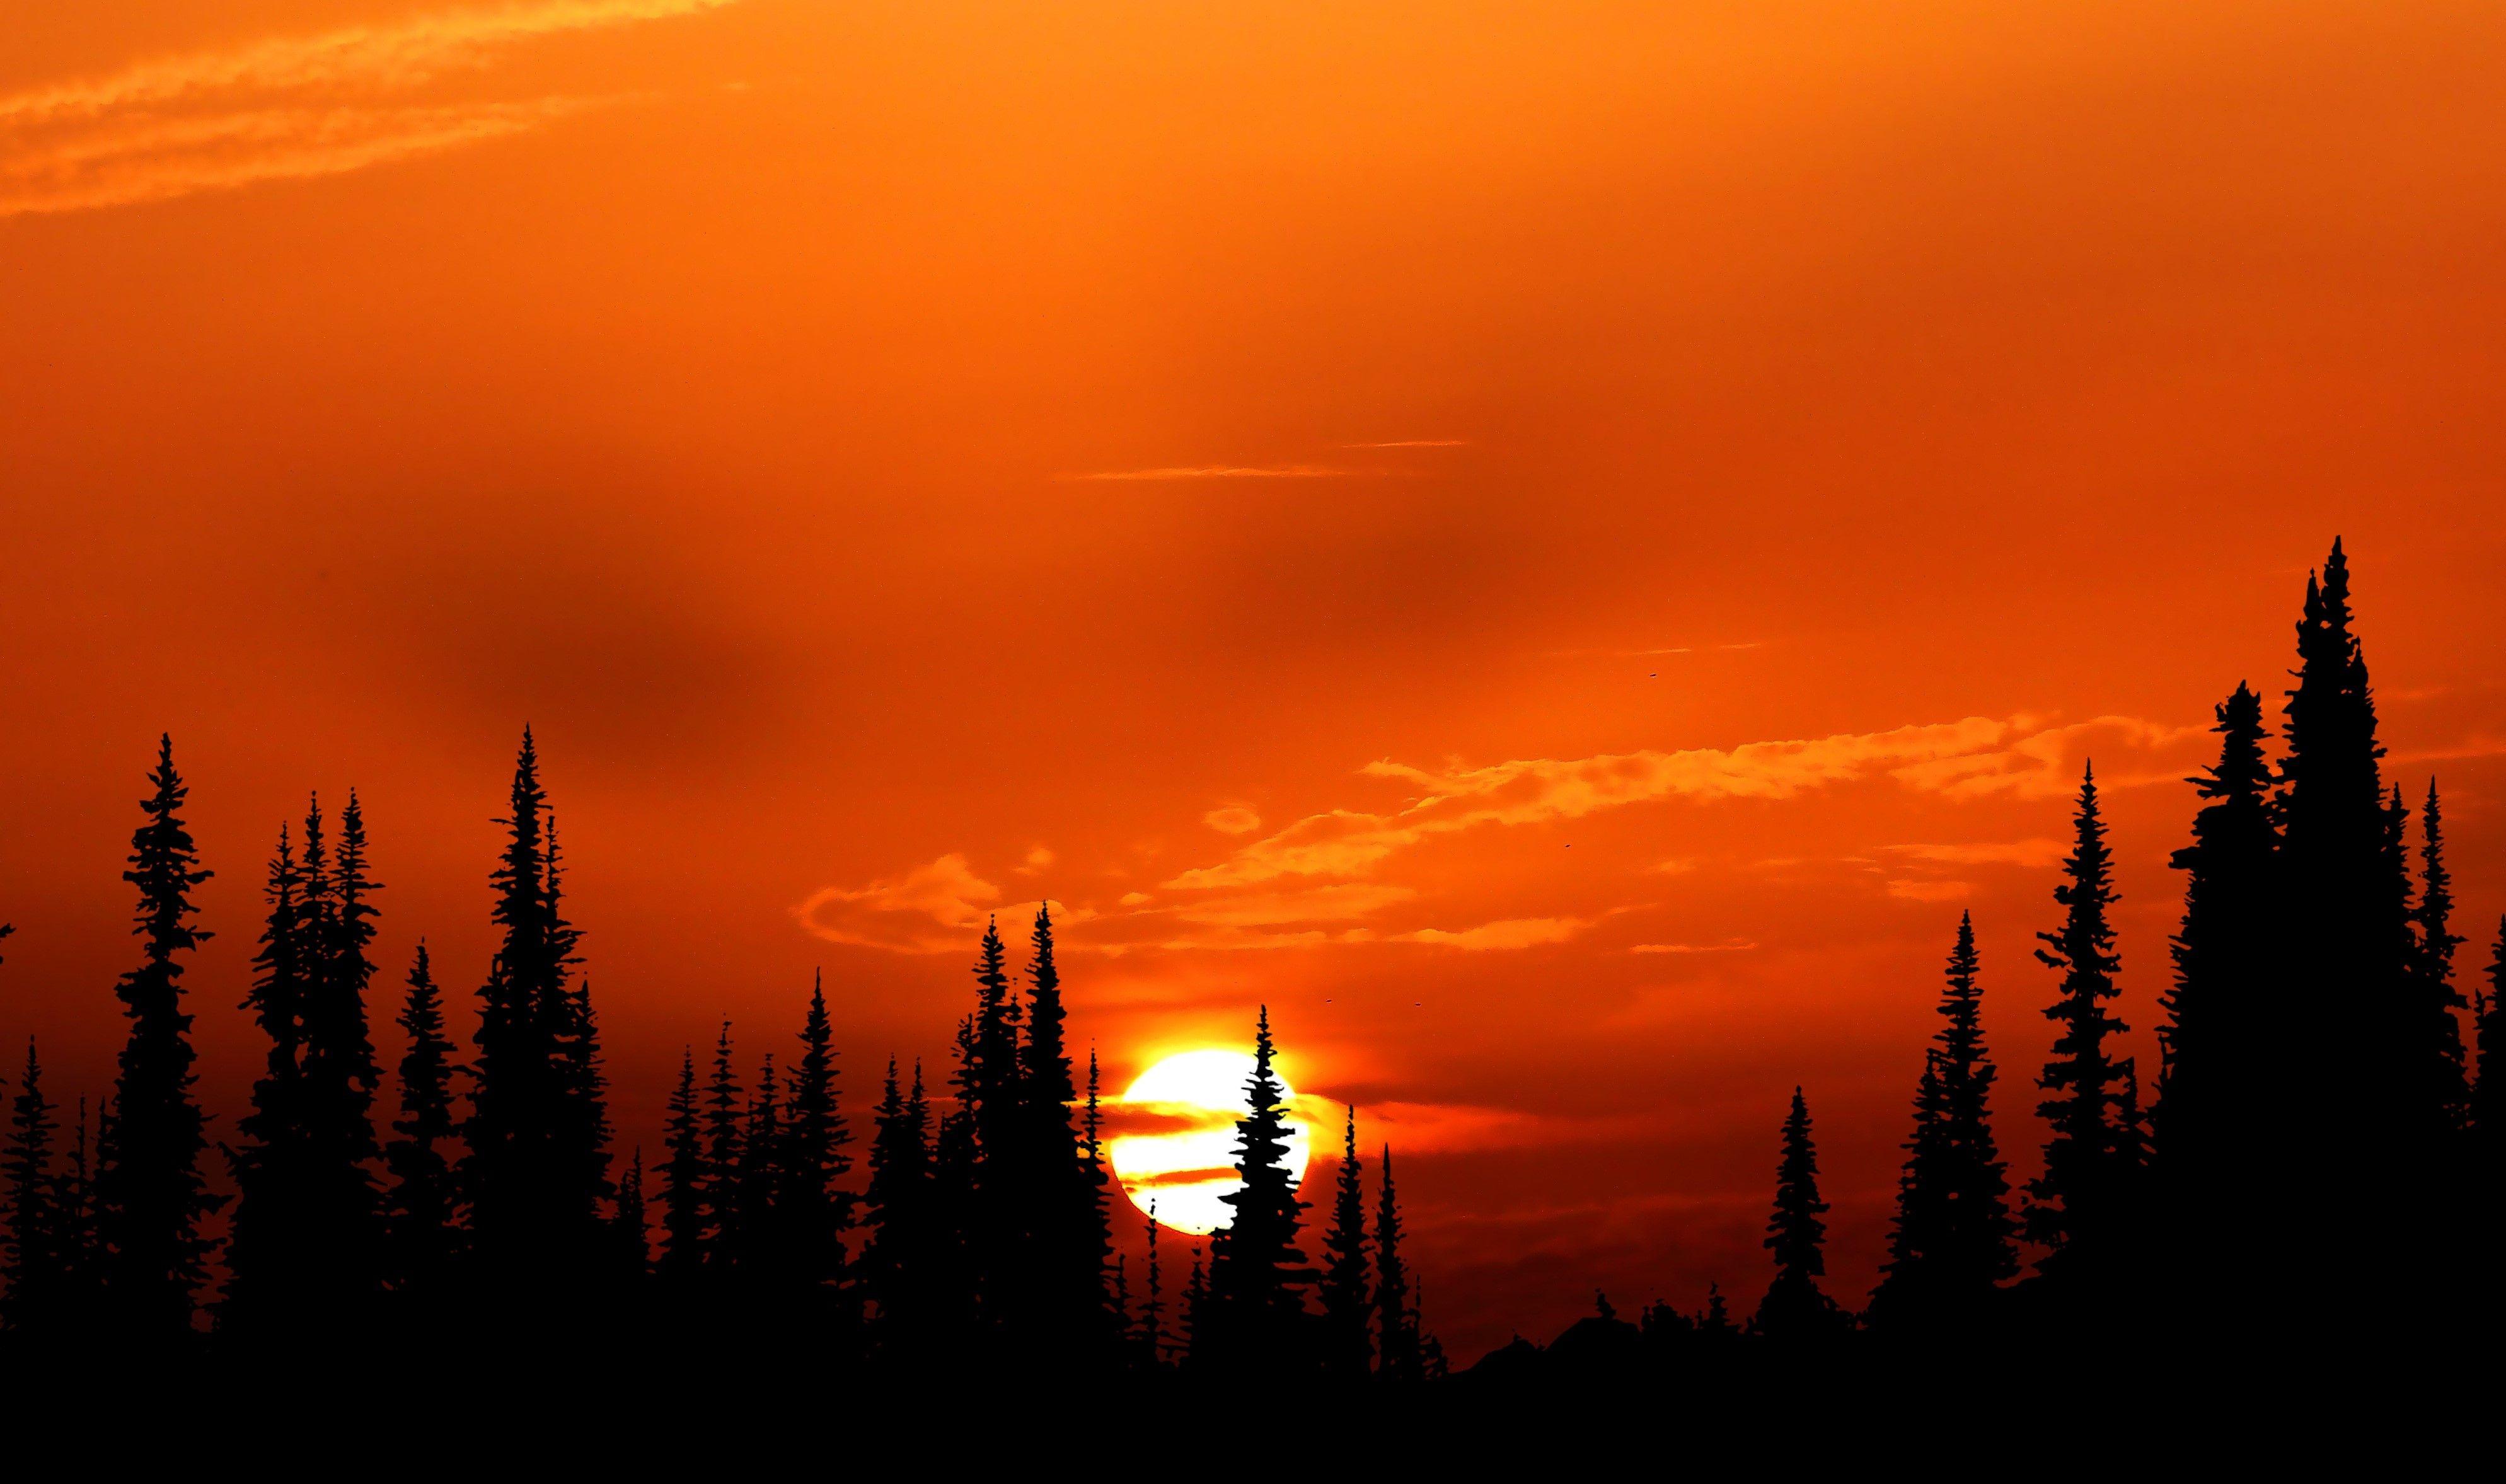 Relaxing Orange Sunset Evening 4k Relaxing Orange Sunset Evening 4k Wallpapers Sunset Nature Sunset Nature